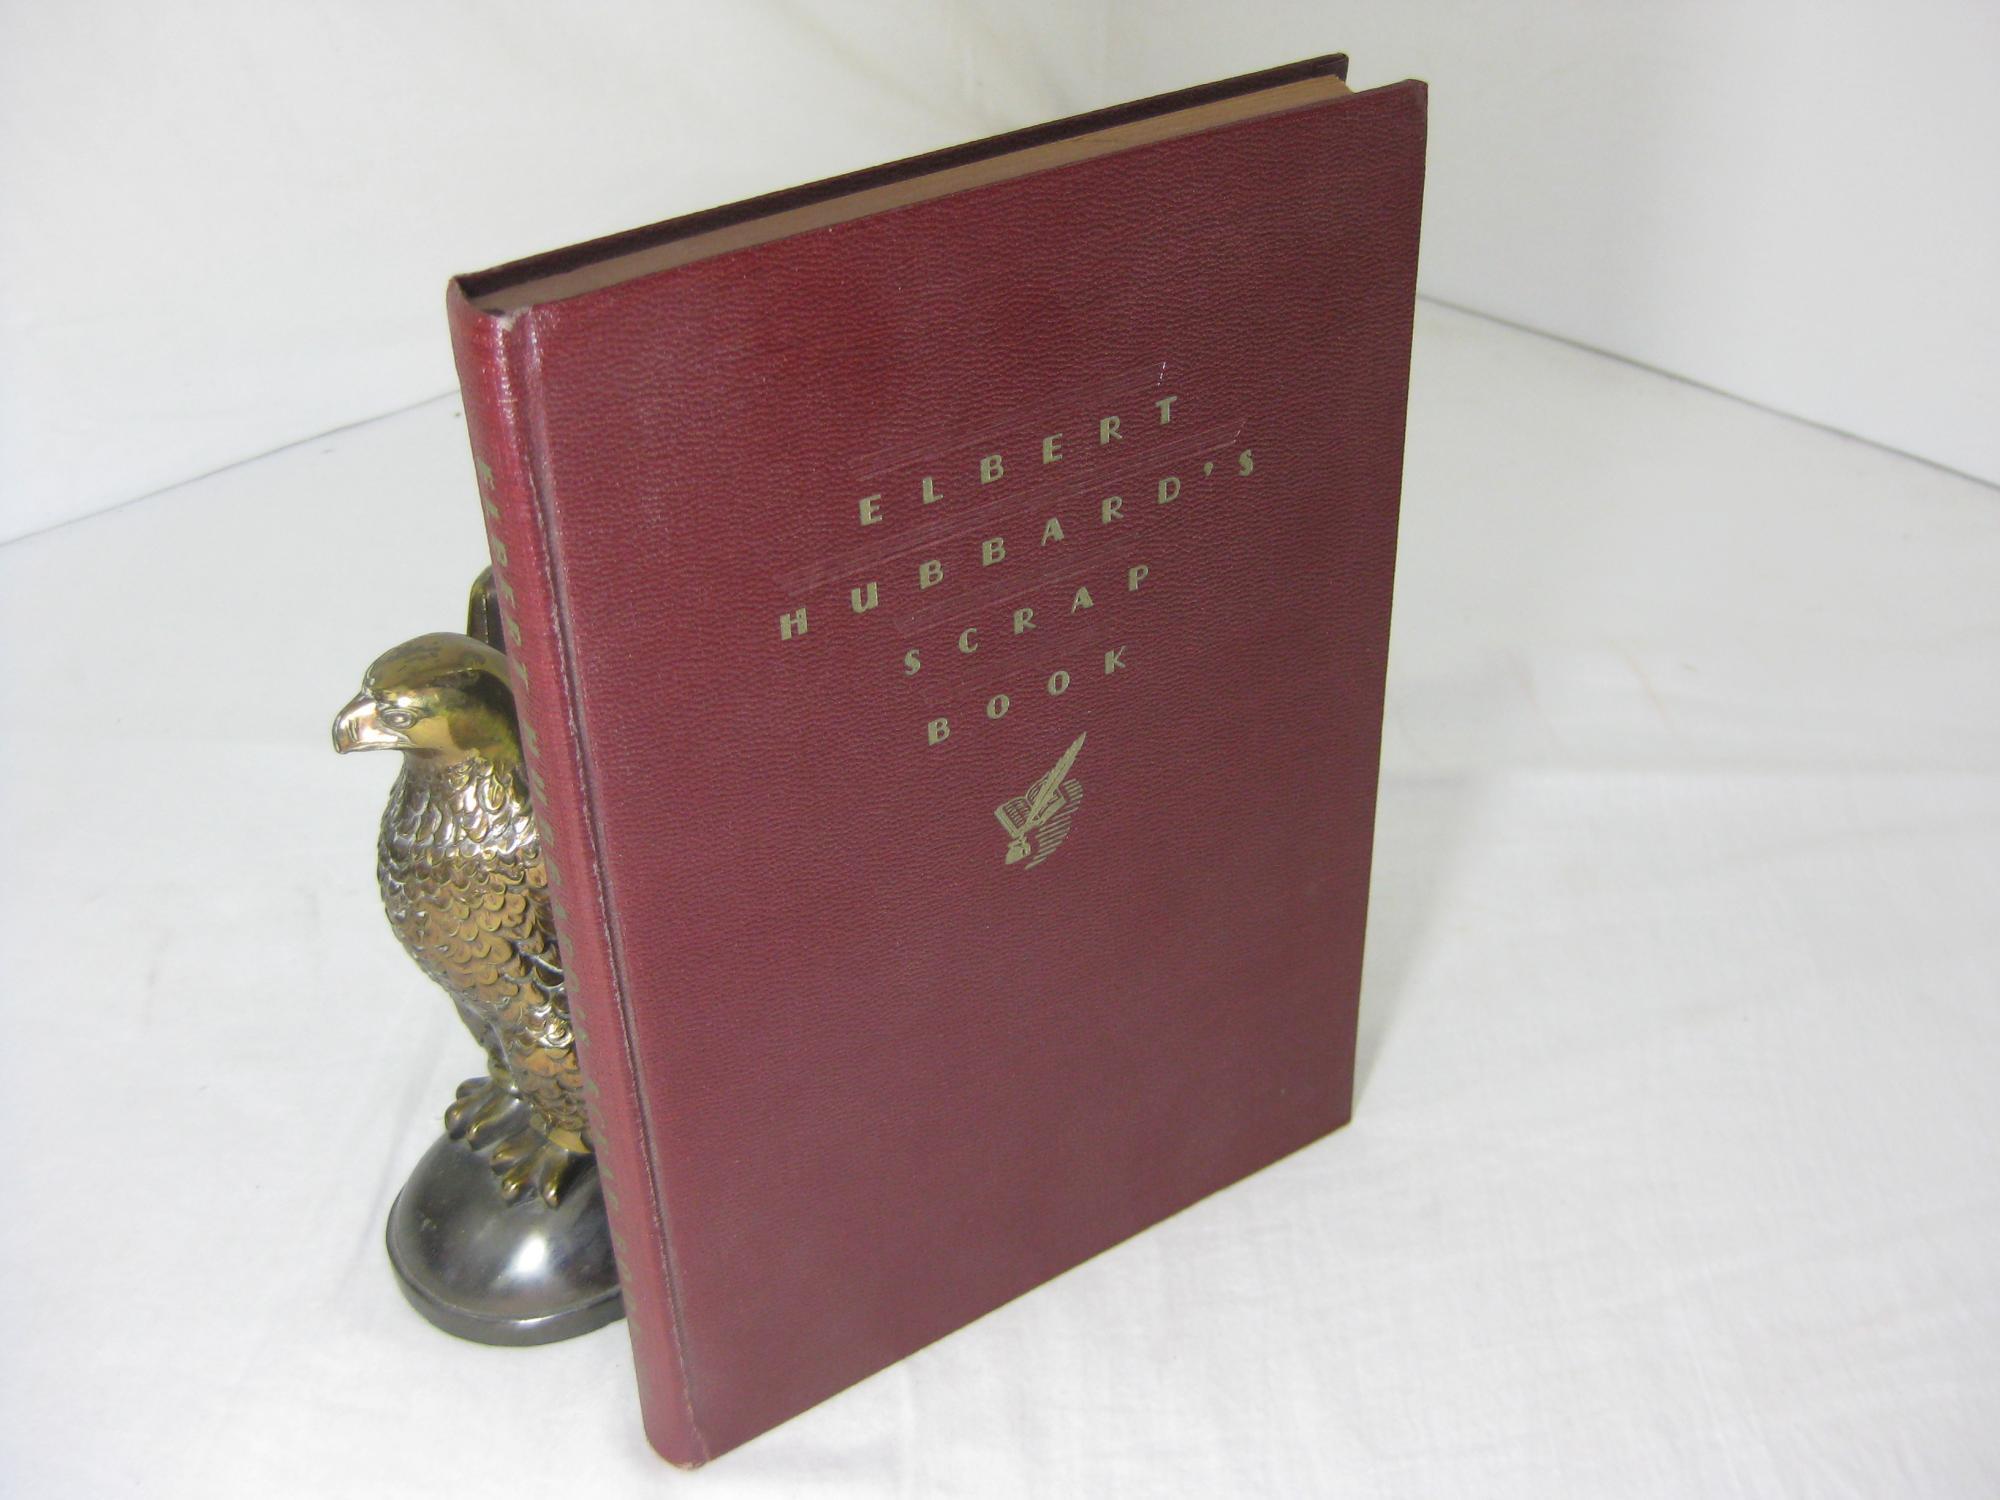 Elbert Hubbard's Scrap Book book image